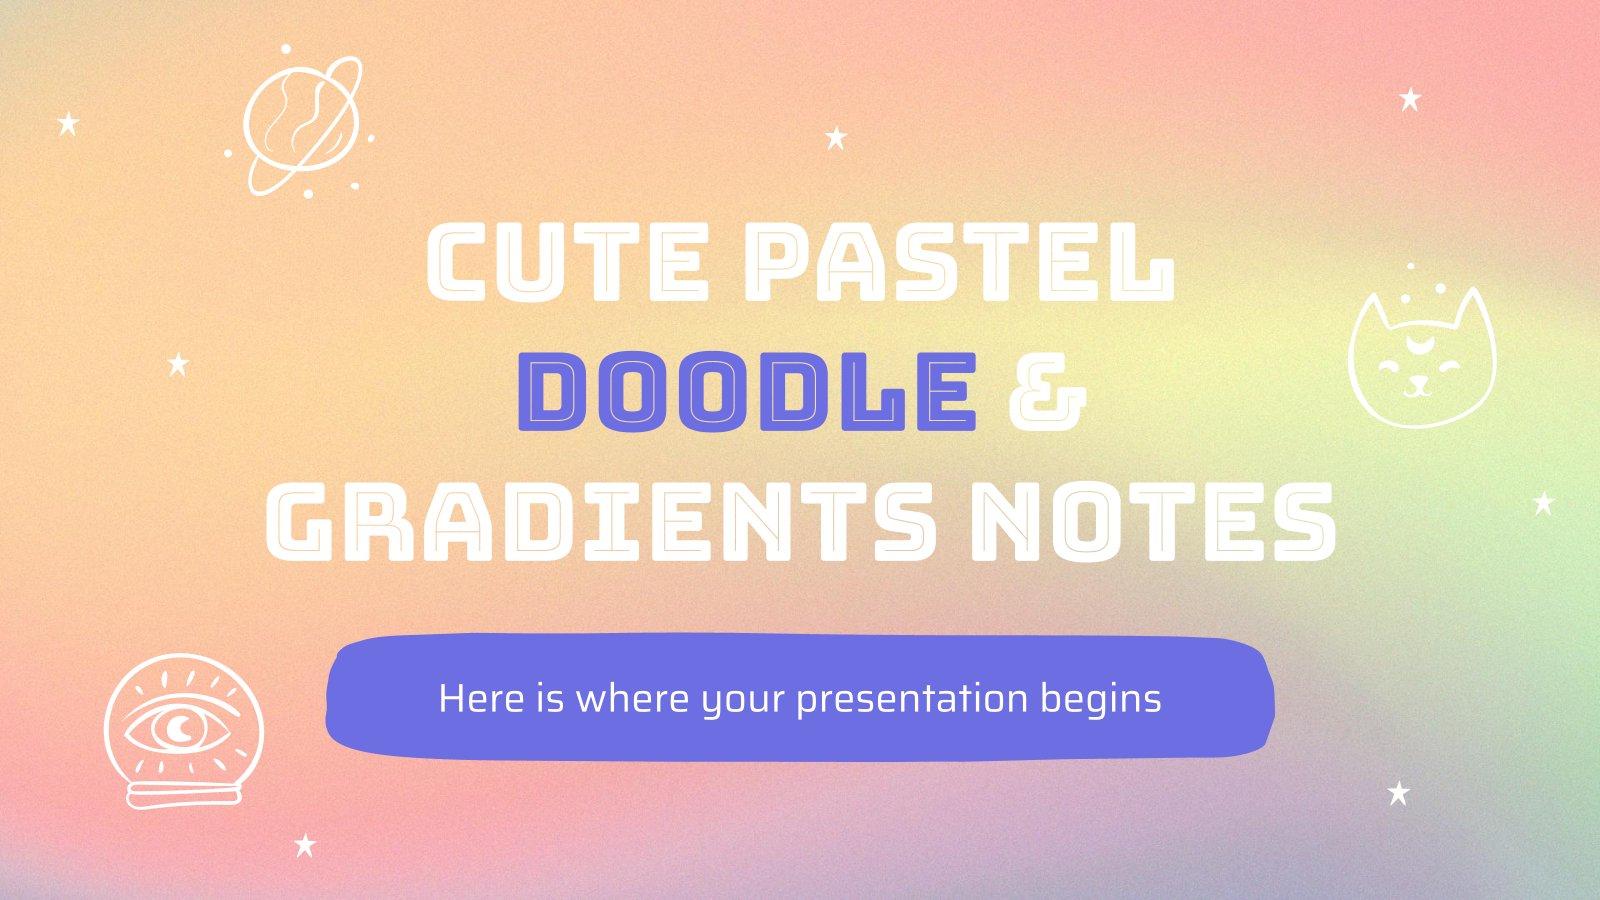 Cute Pastel Doodle & Gradients Notes presentation template